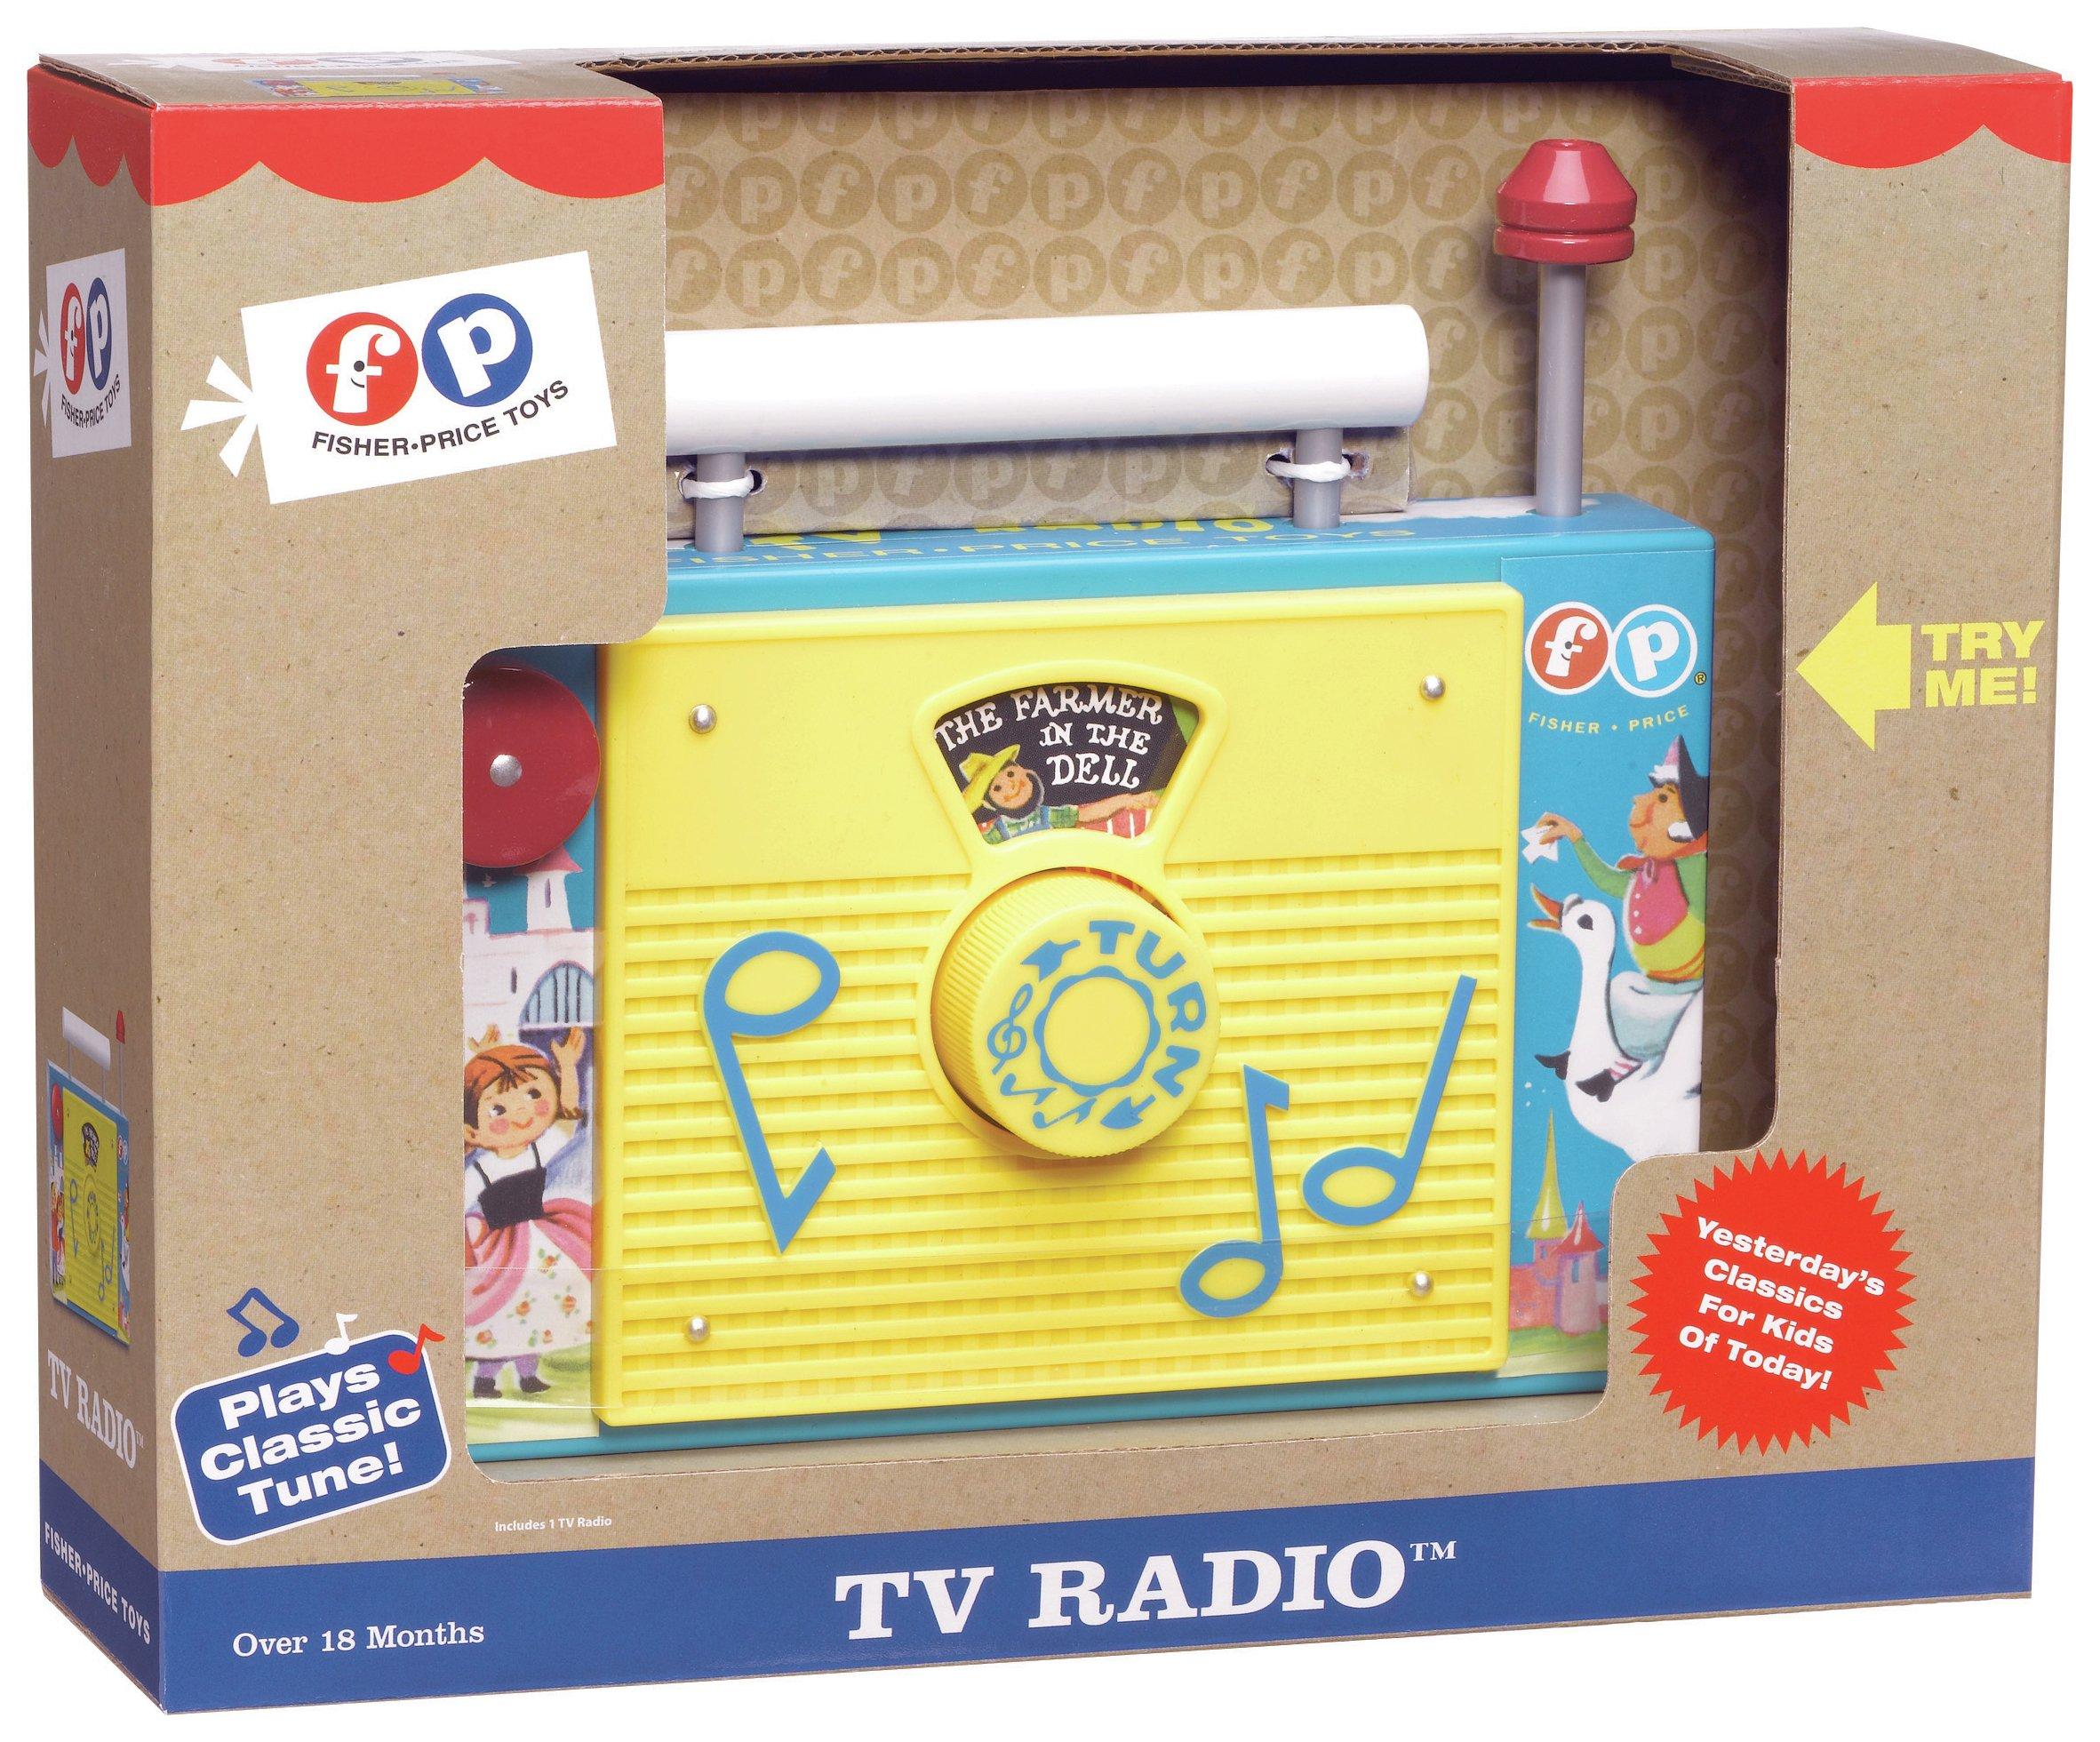 Image of Fisher Price - Classics TV Radio - Game.